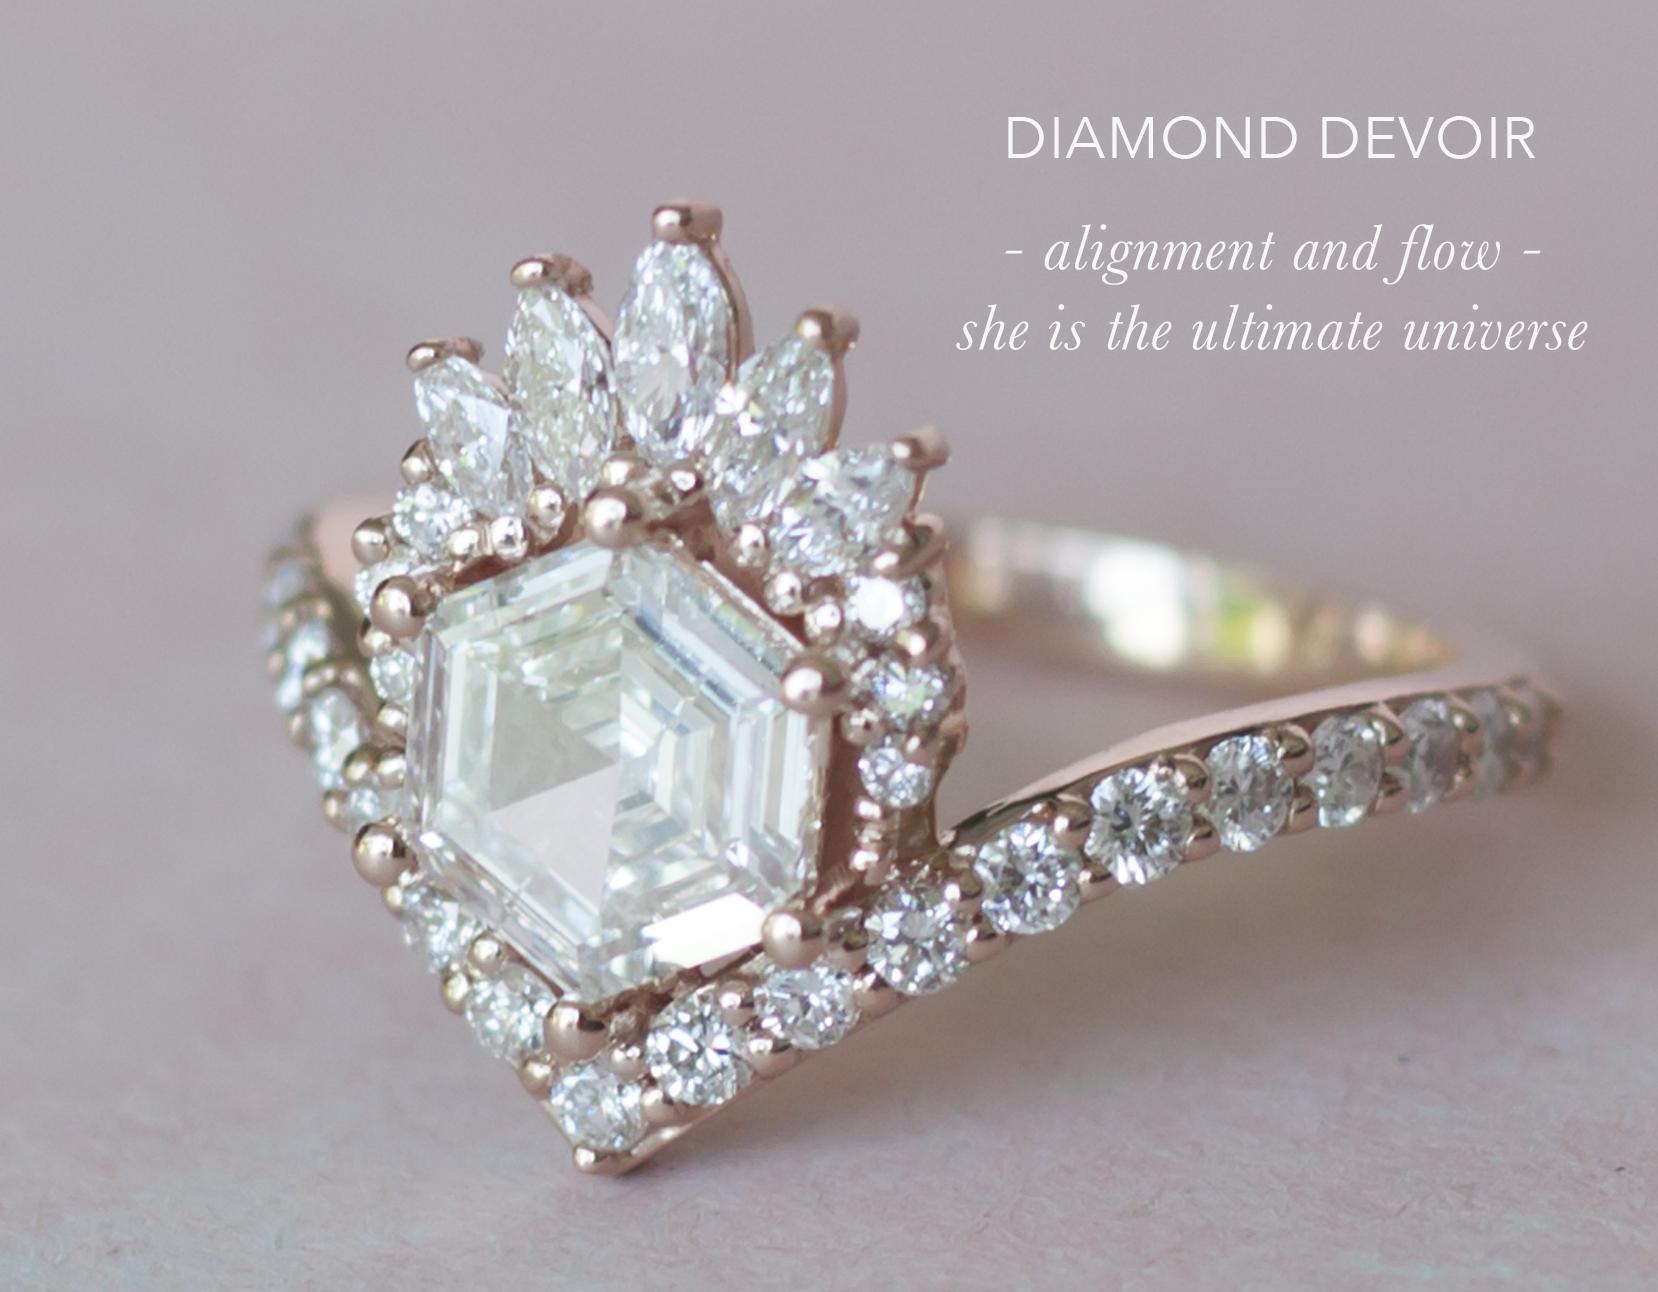 Hexagon Diamond Engagement Ring - Diamond Crown Engagement Ring - Anastassia Sel Jewelry